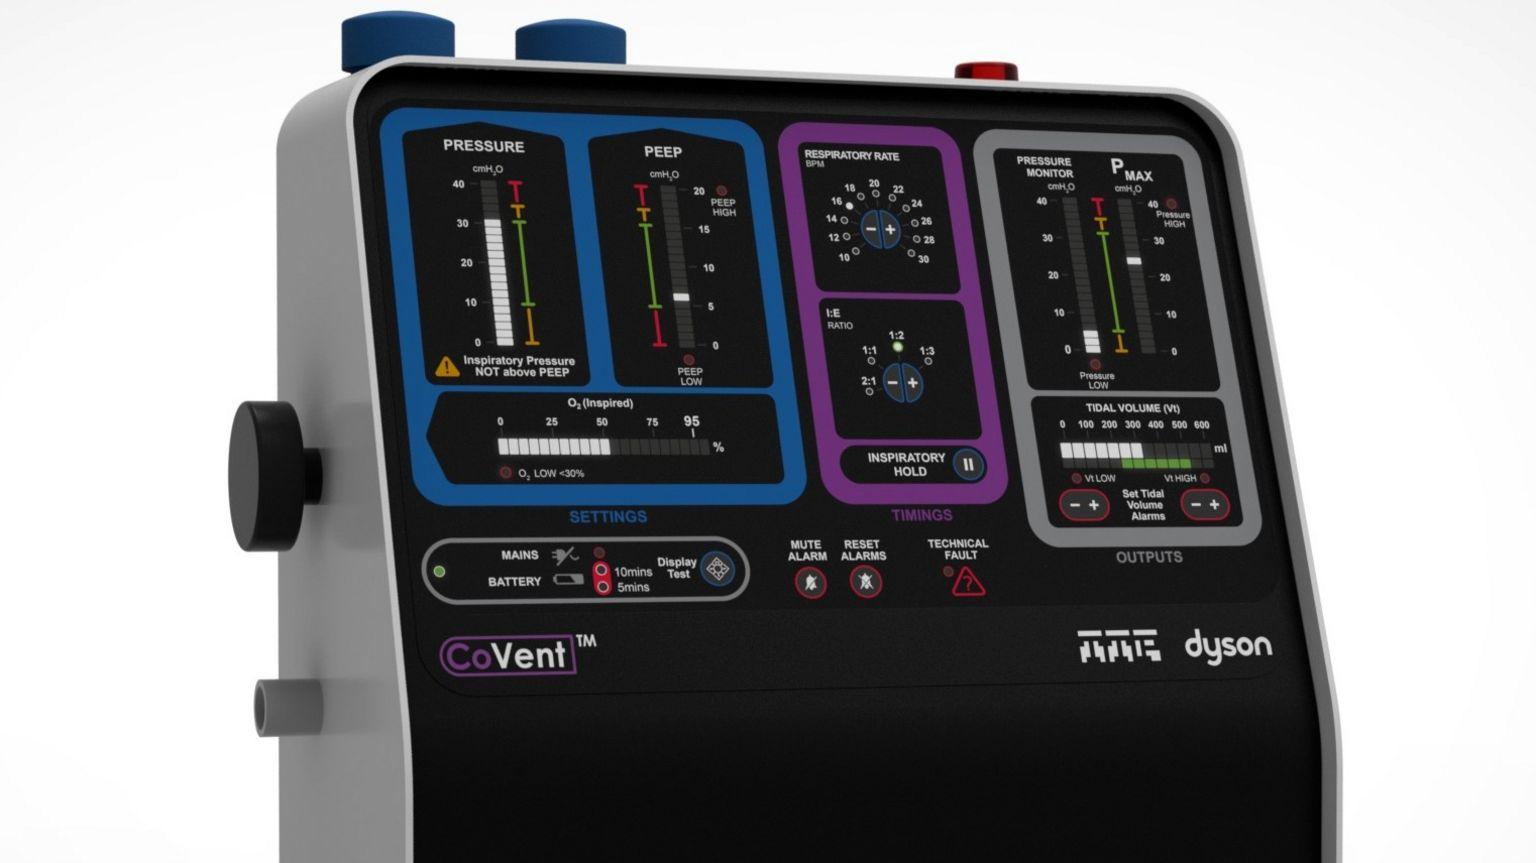 Dyson's prototype ventilator